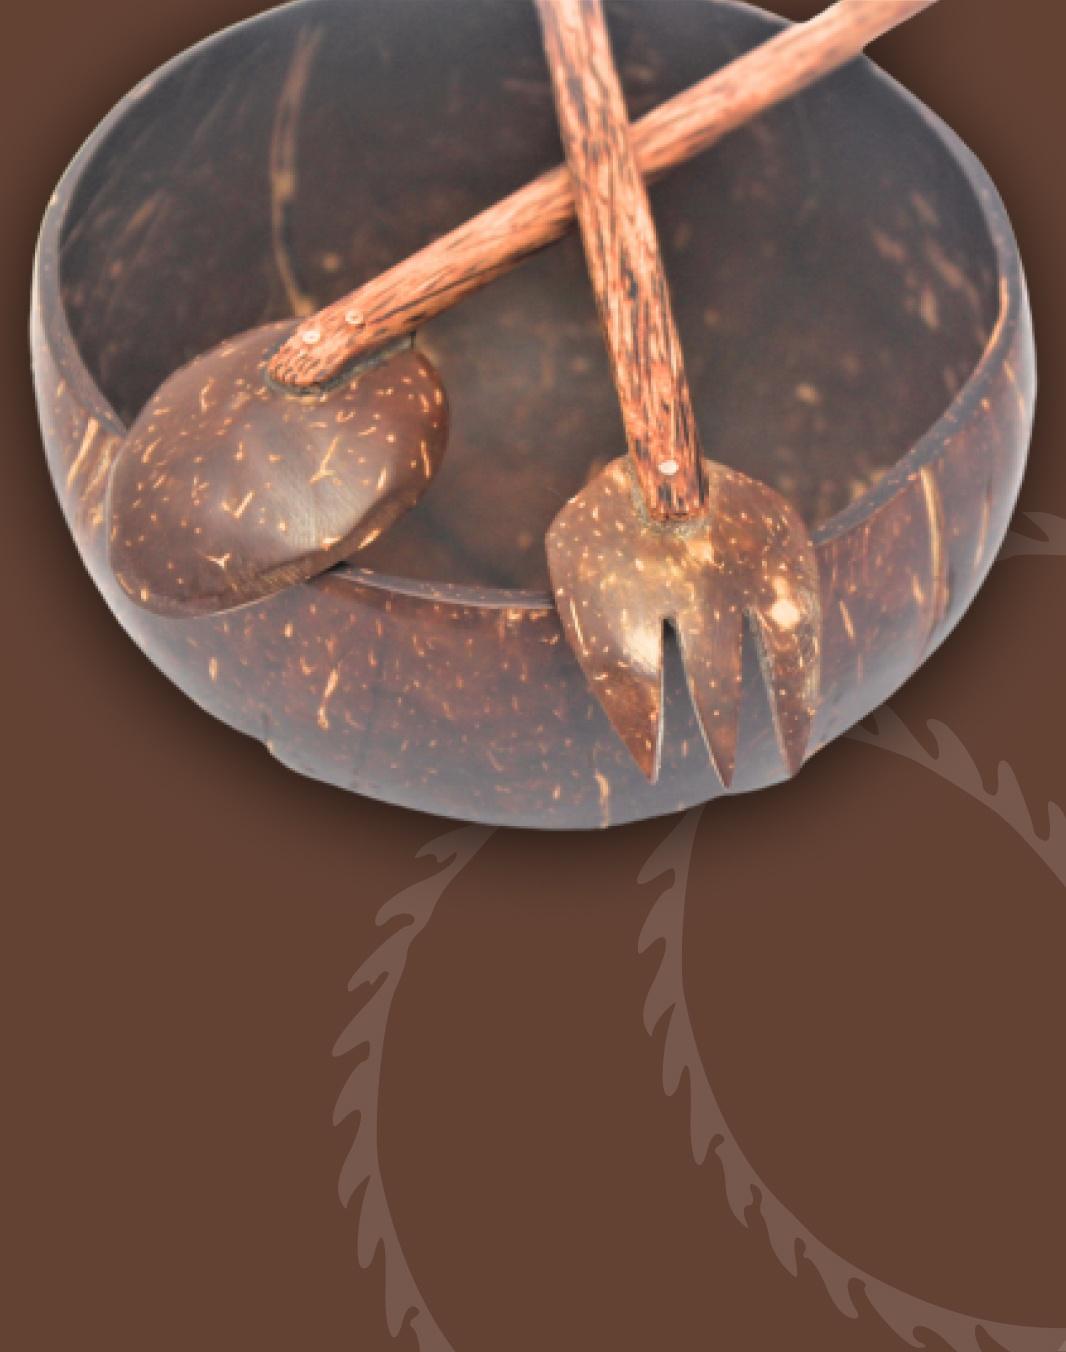 Jumbo Coconut Bowl + Spoon & Fork